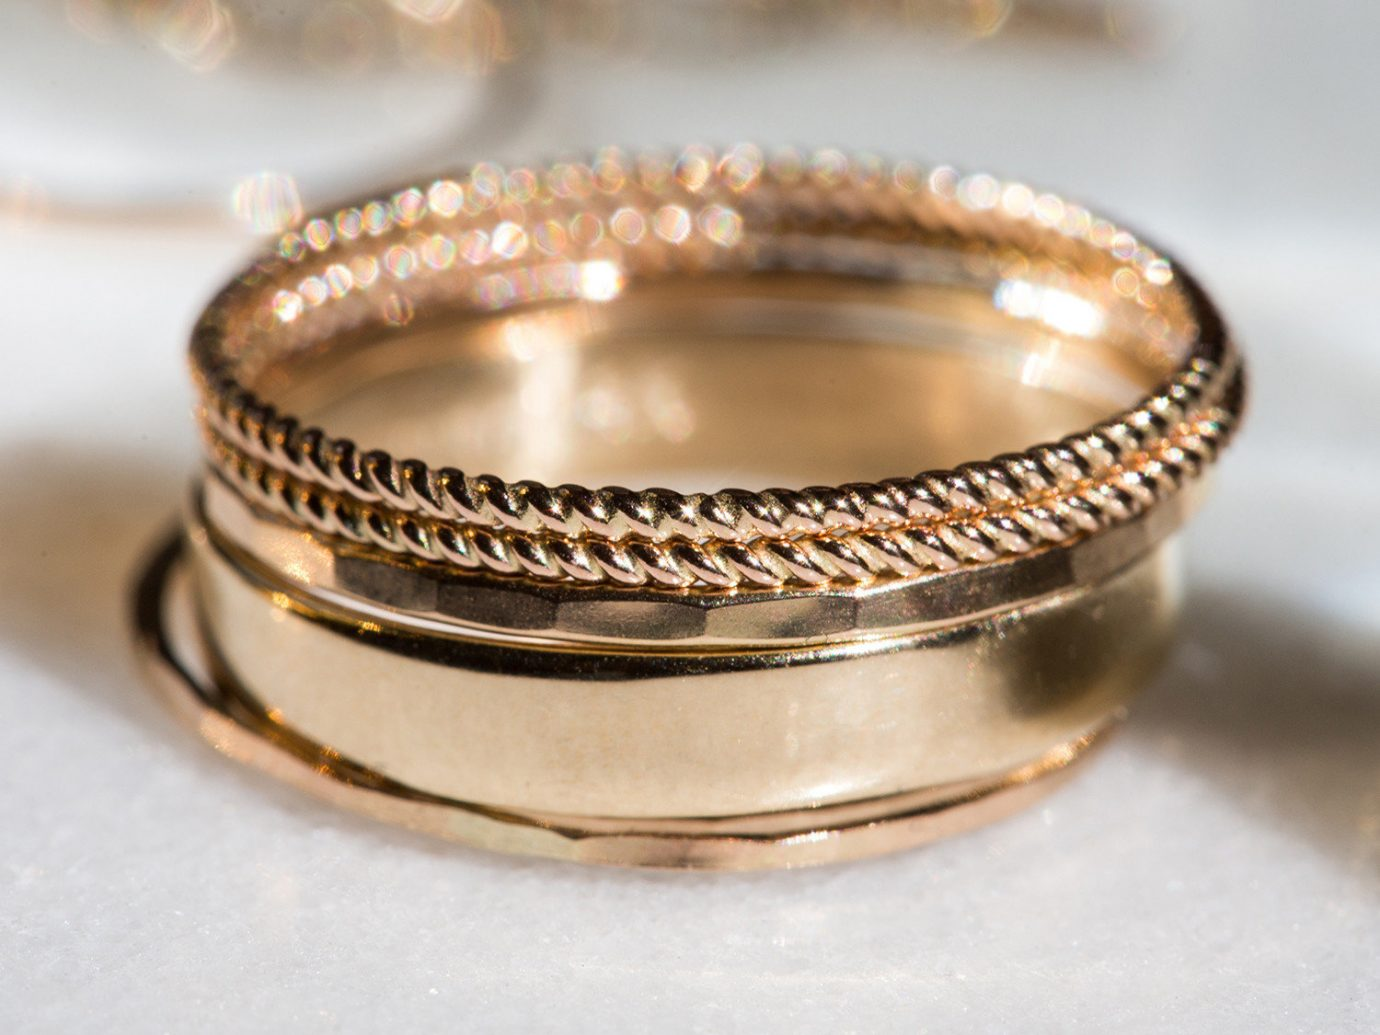 City Trip Ideas Weekend Getaways jewellery cup indoor ring chocolate dessert accessory wedding ring bangle metal body jewelry wedding ceremony supply